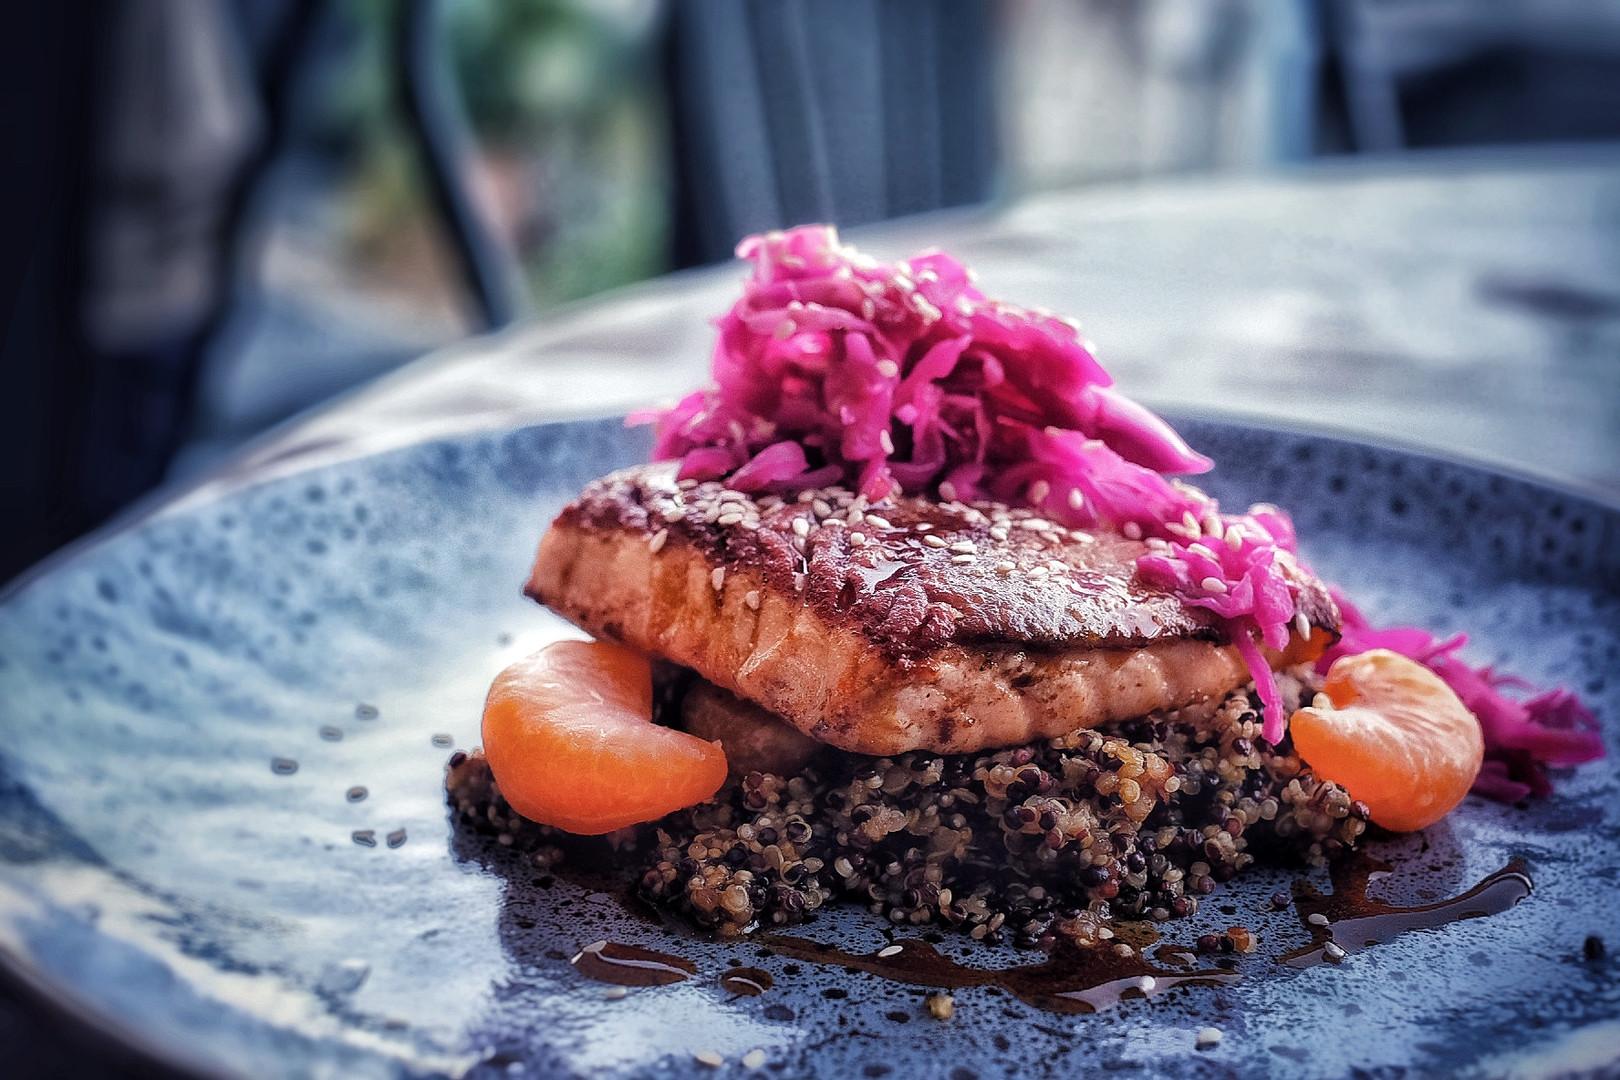 Pan fried salmon, mandarin ponzu, quinoa, sauerkraut